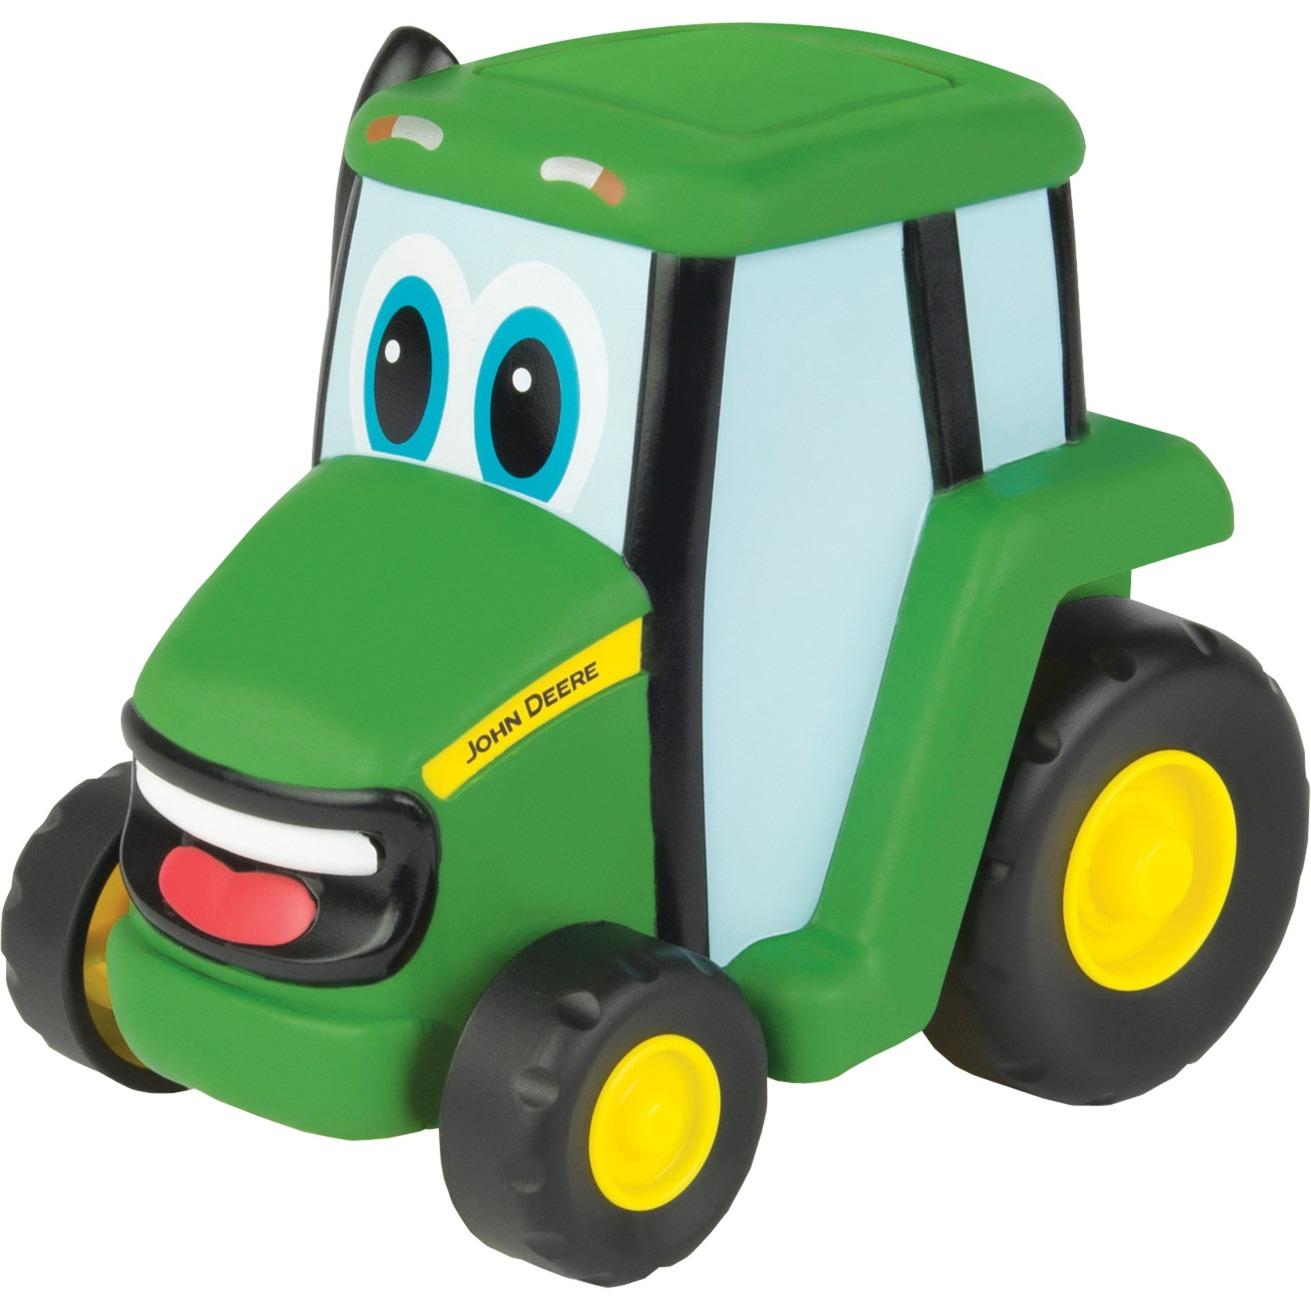 42925A1, Vehículo de juguete